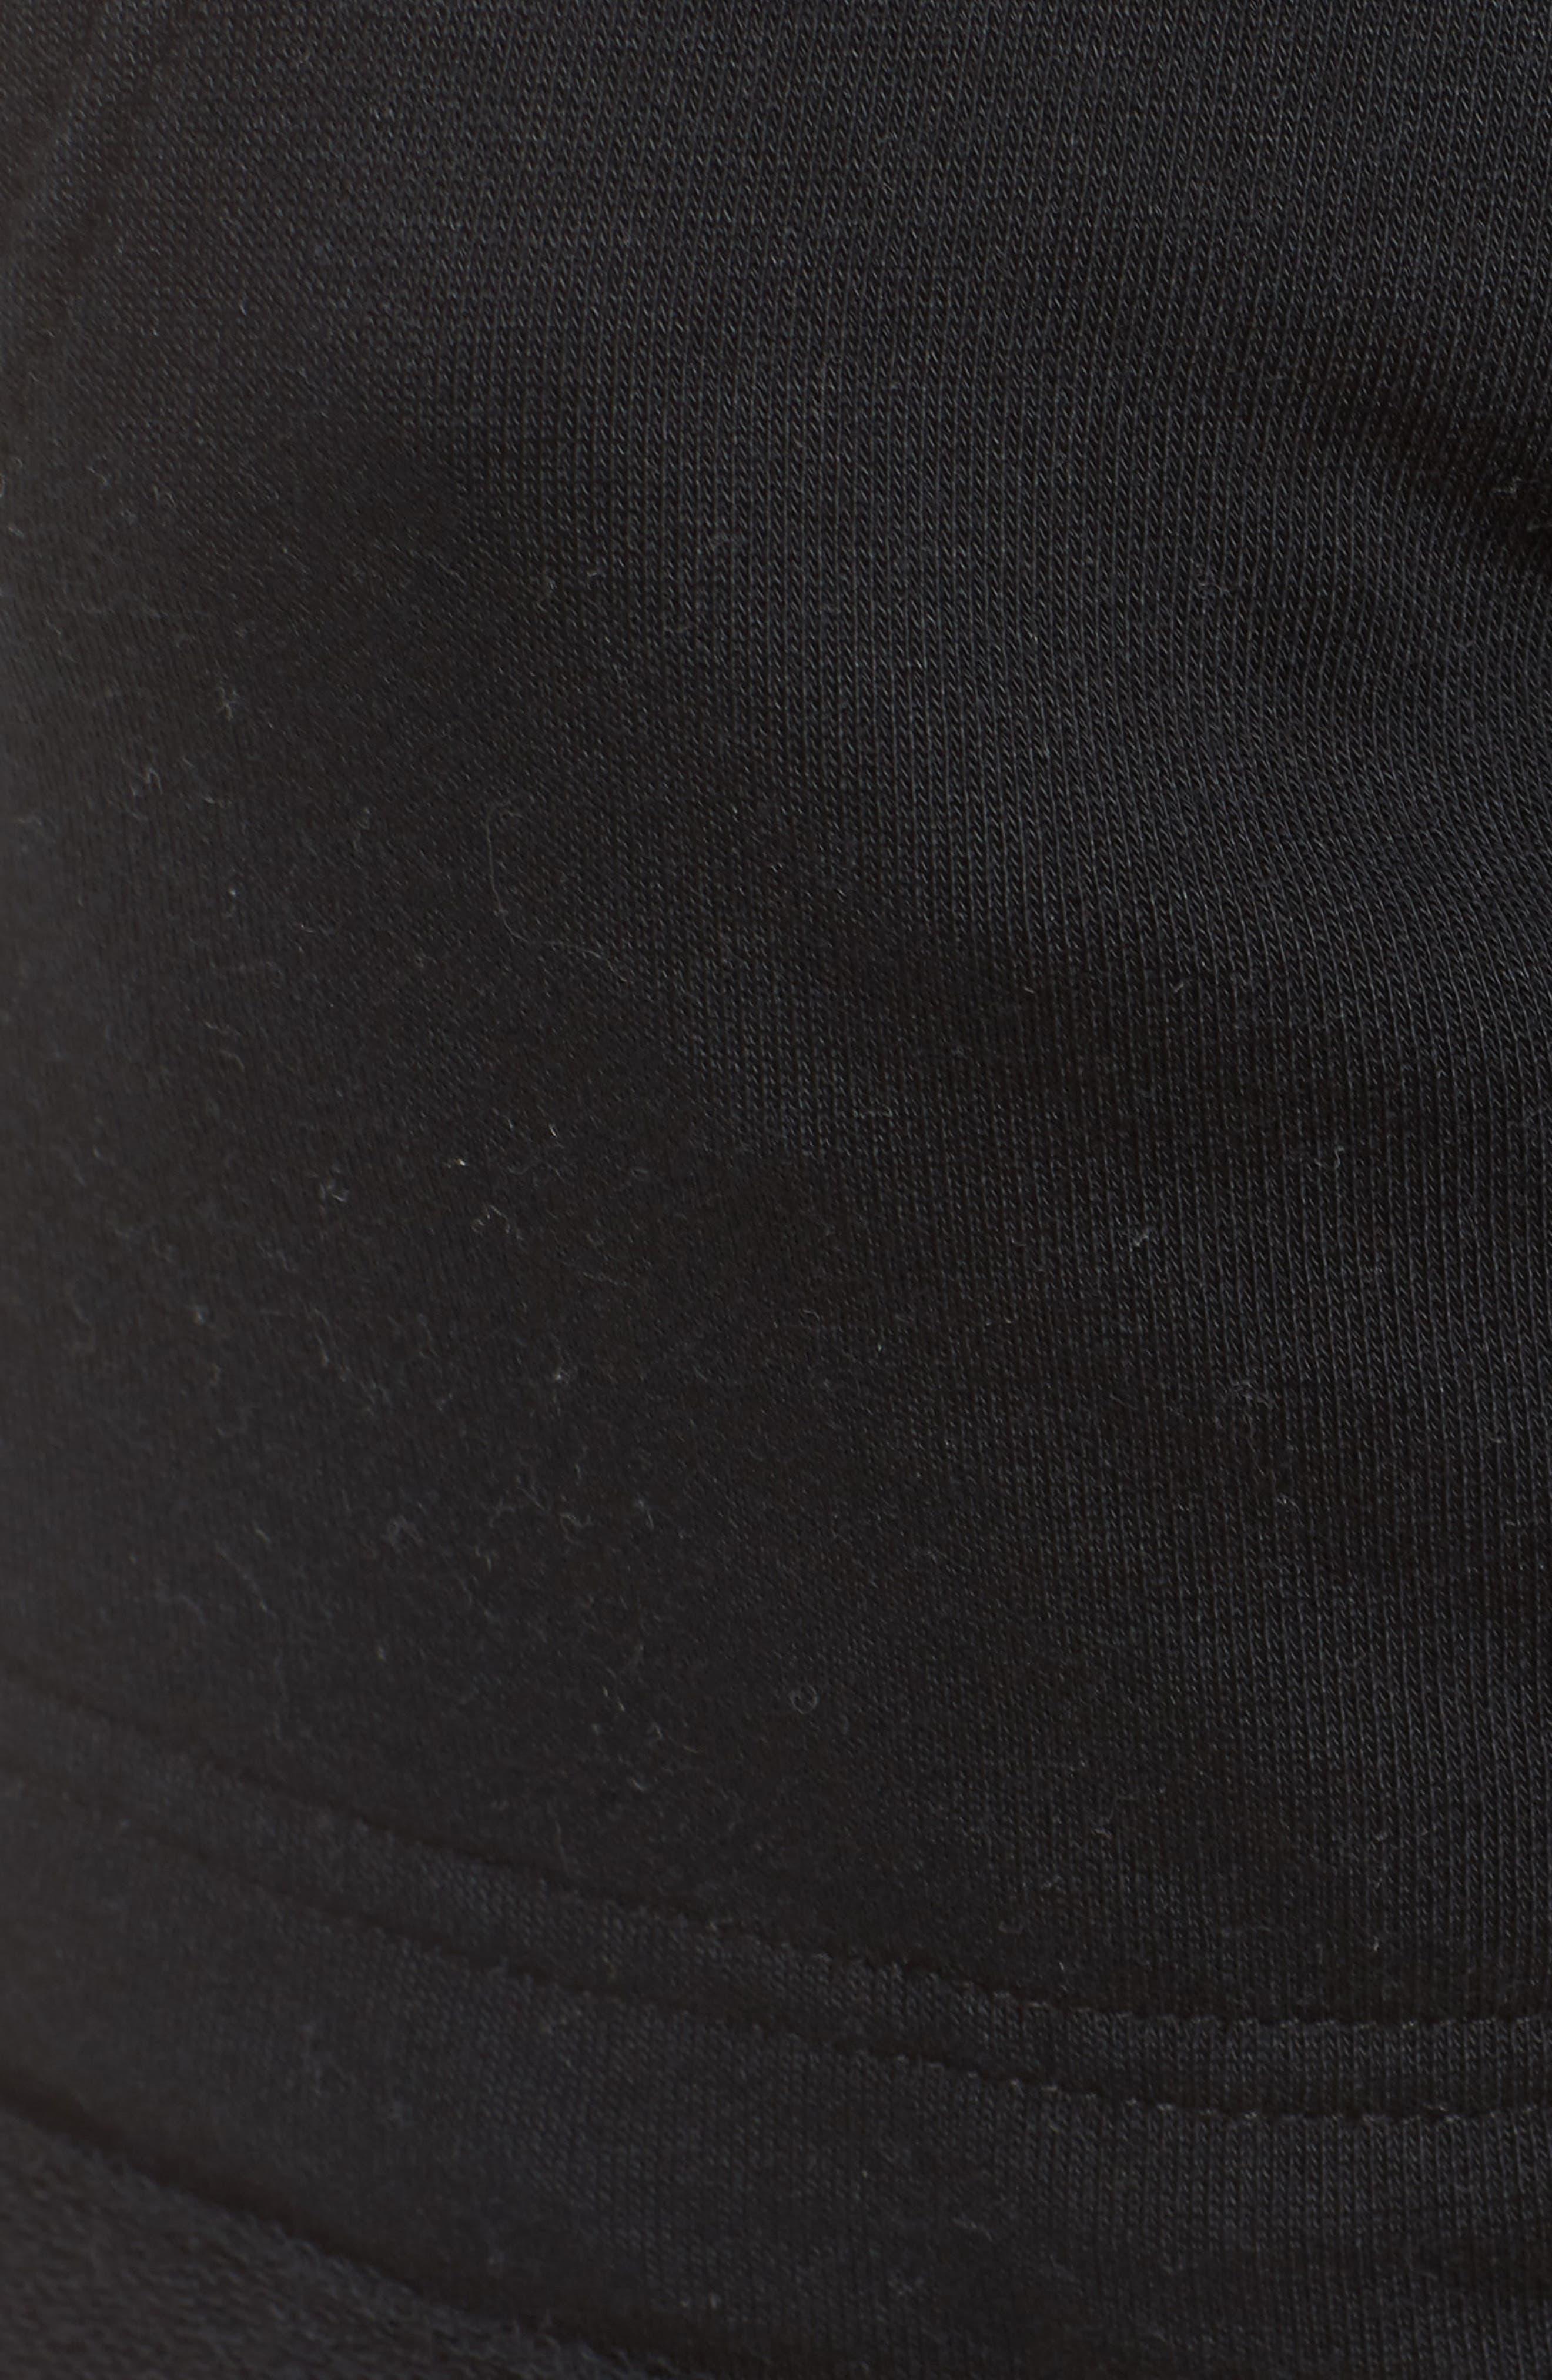 Lounge Shorts,                             Alternate thumbnail 5, color,                             003